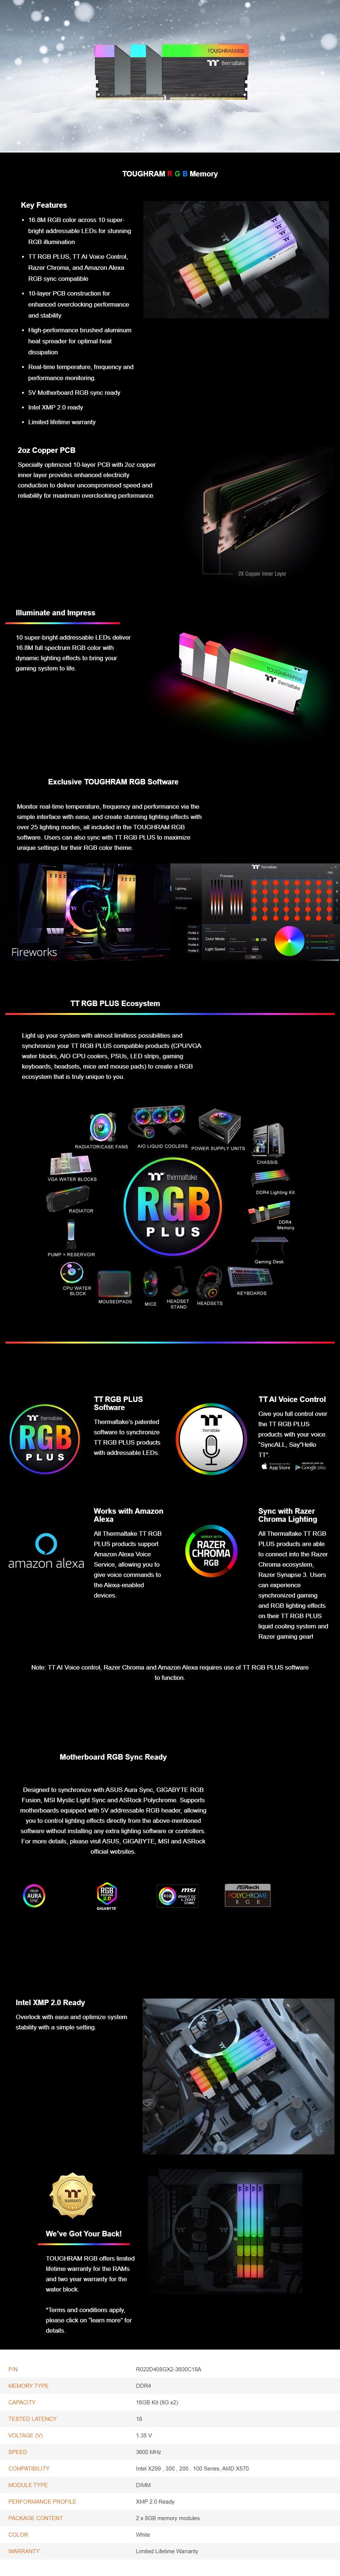 Thermaltake TOUGHRAM RGB 16GB (2x 8GB) DDR4 3200MHz Memory - White - Overview 1